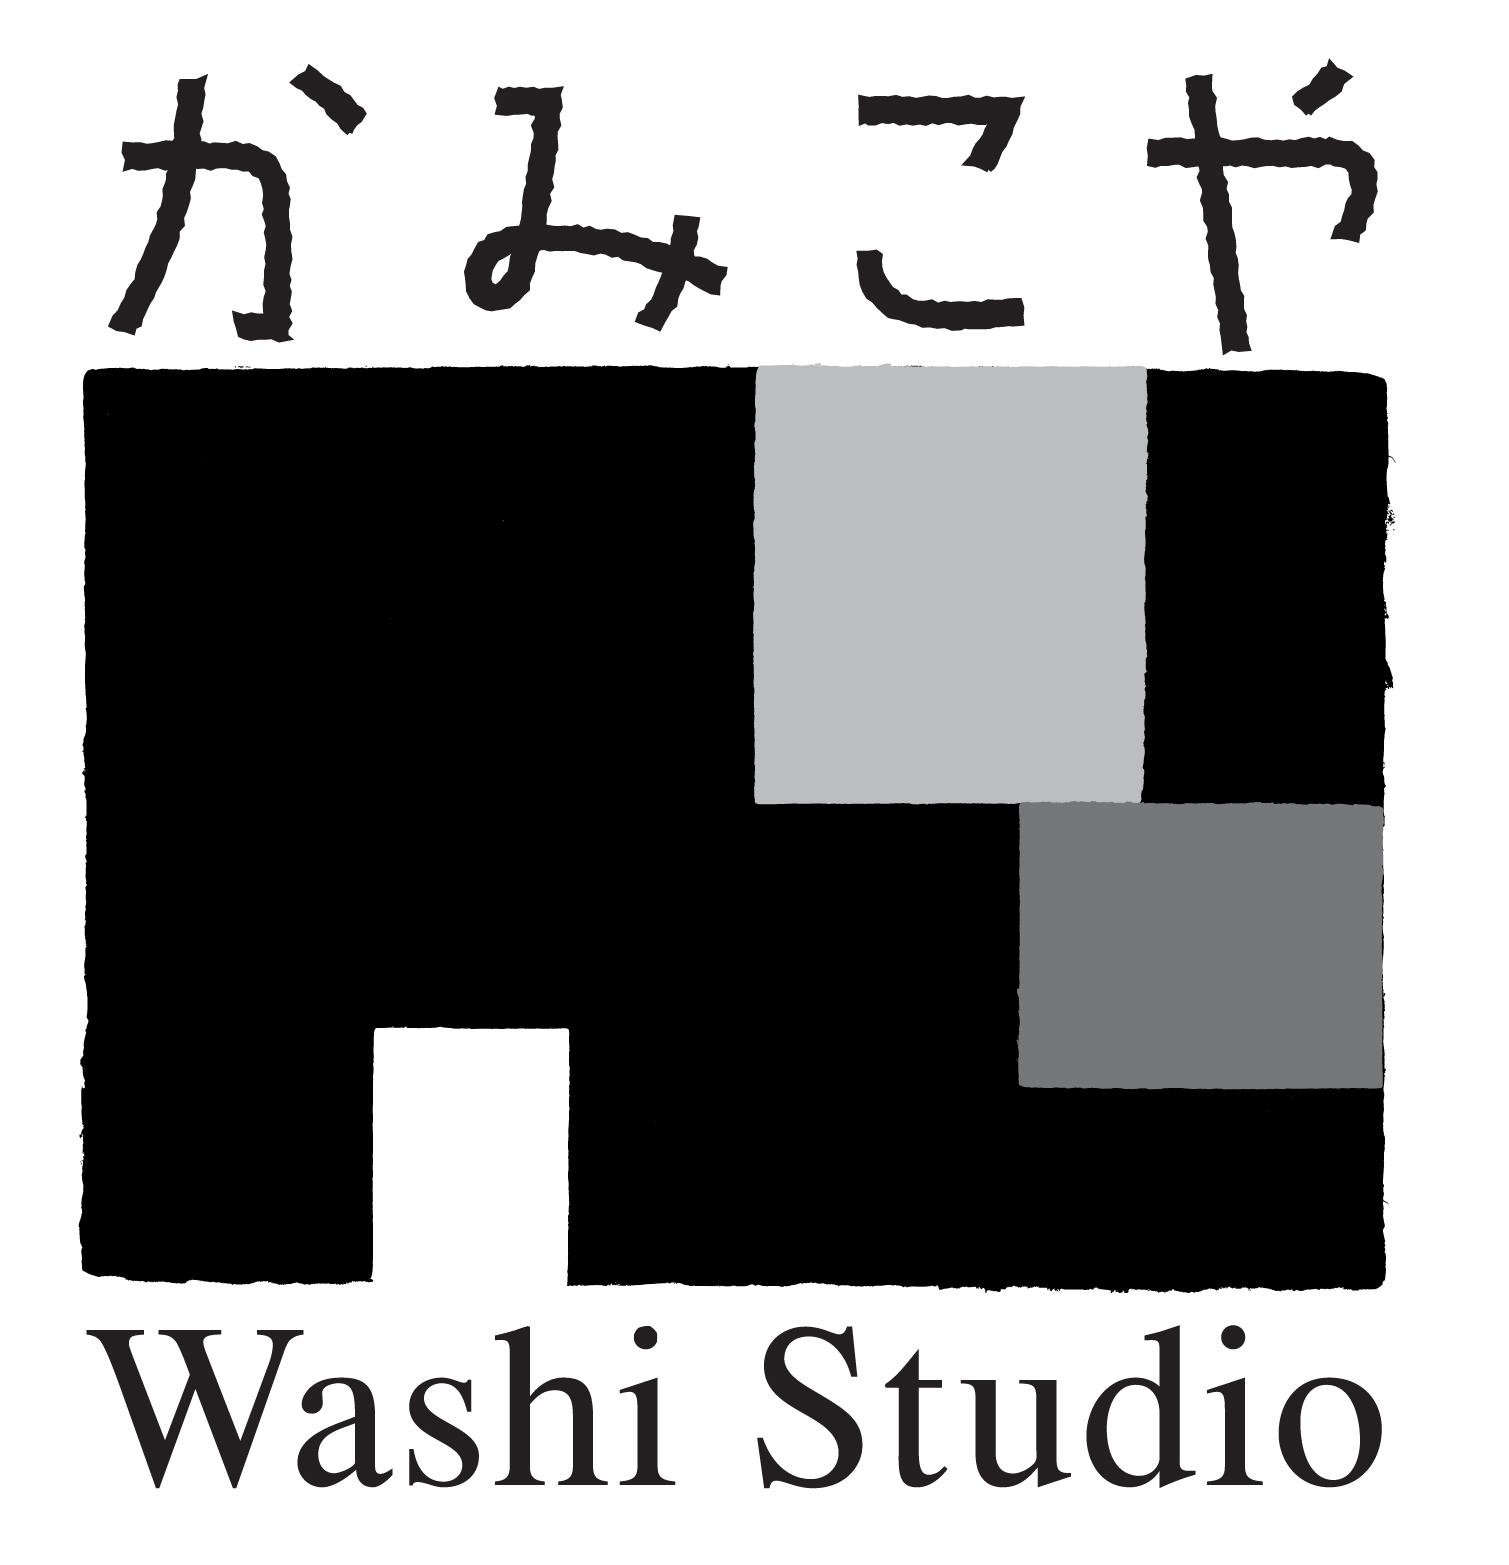 Washi Studio かみこや